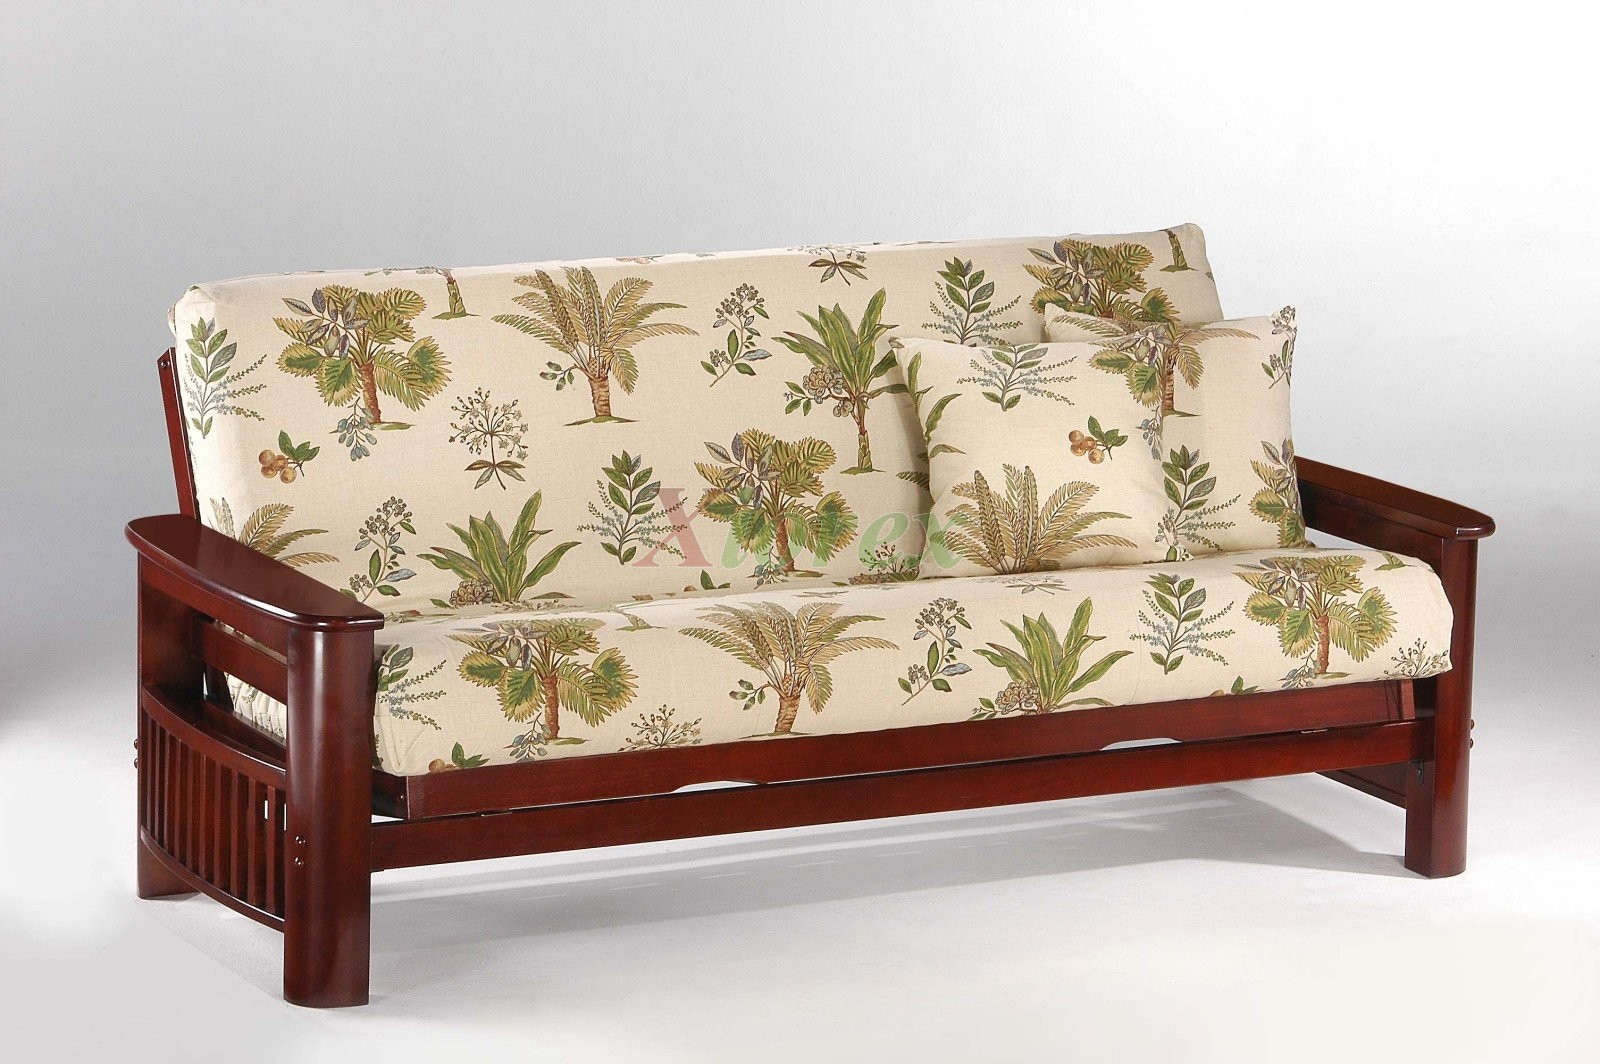 night and day portofino futon sofabed in rosewood   xiorex night and day portofino futon sofabed honey oak natural rosewood teak  rh   xiorex